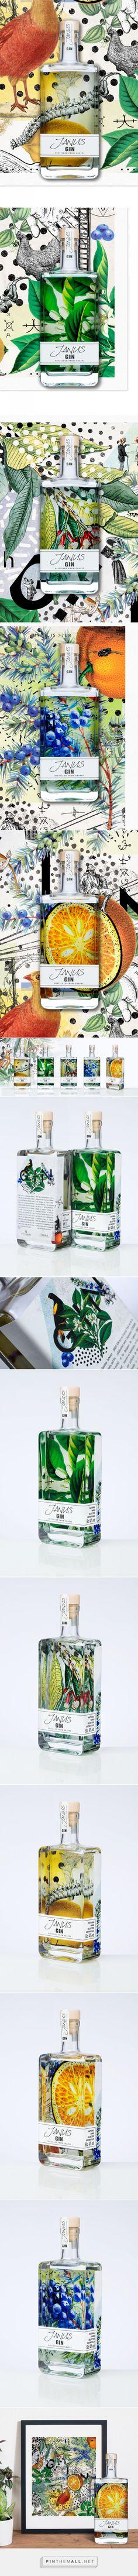 Janus Gin packaging design by LINEA - http://www.packagingoftheworld.com/2018/01/janus-gin.html